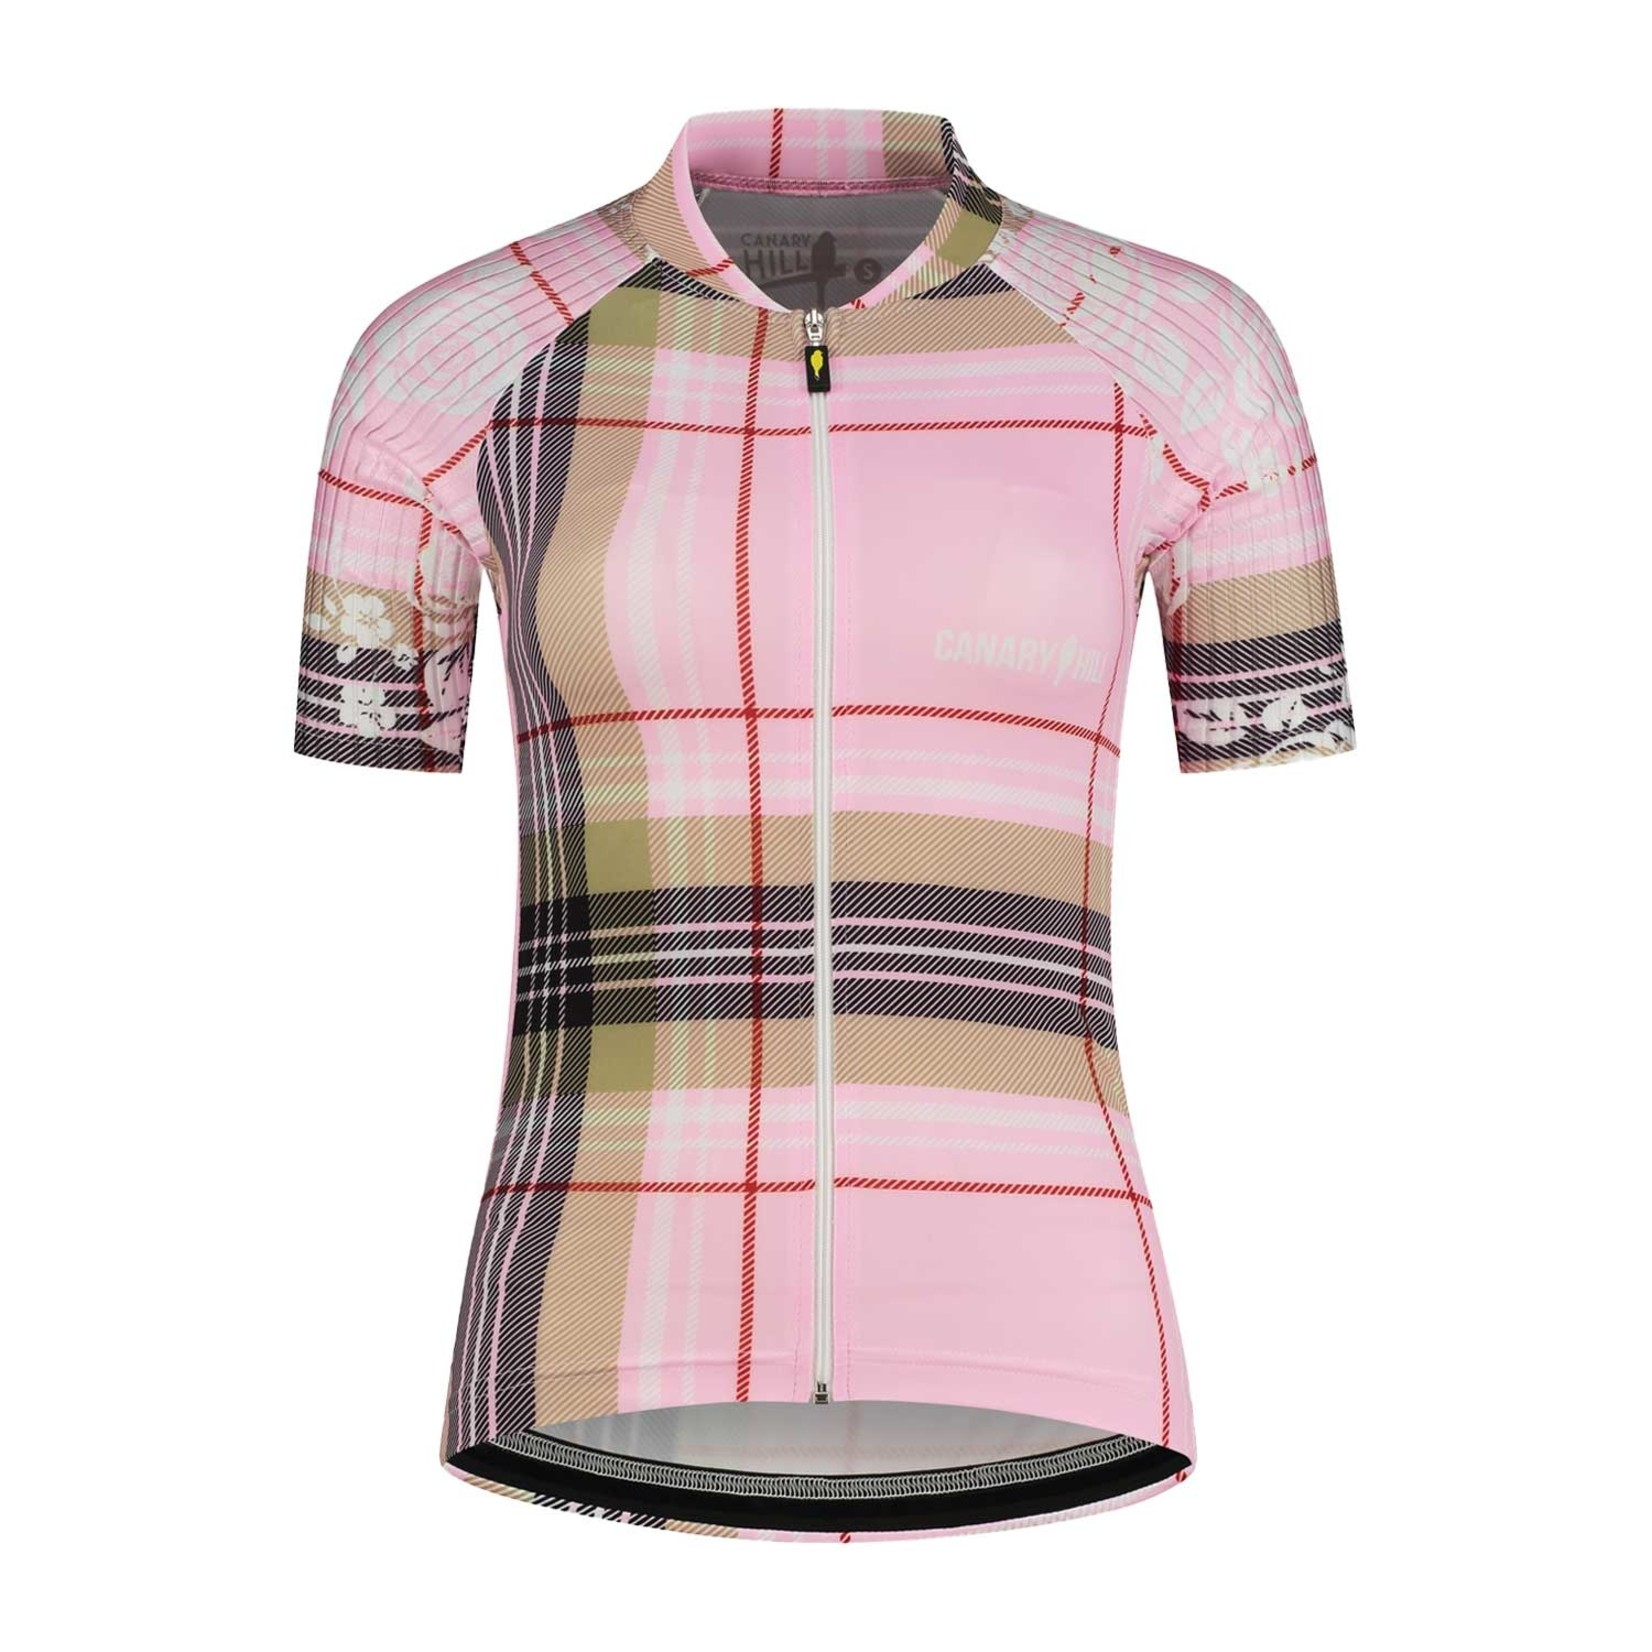 Canary Hill 'Tartan' Shirt